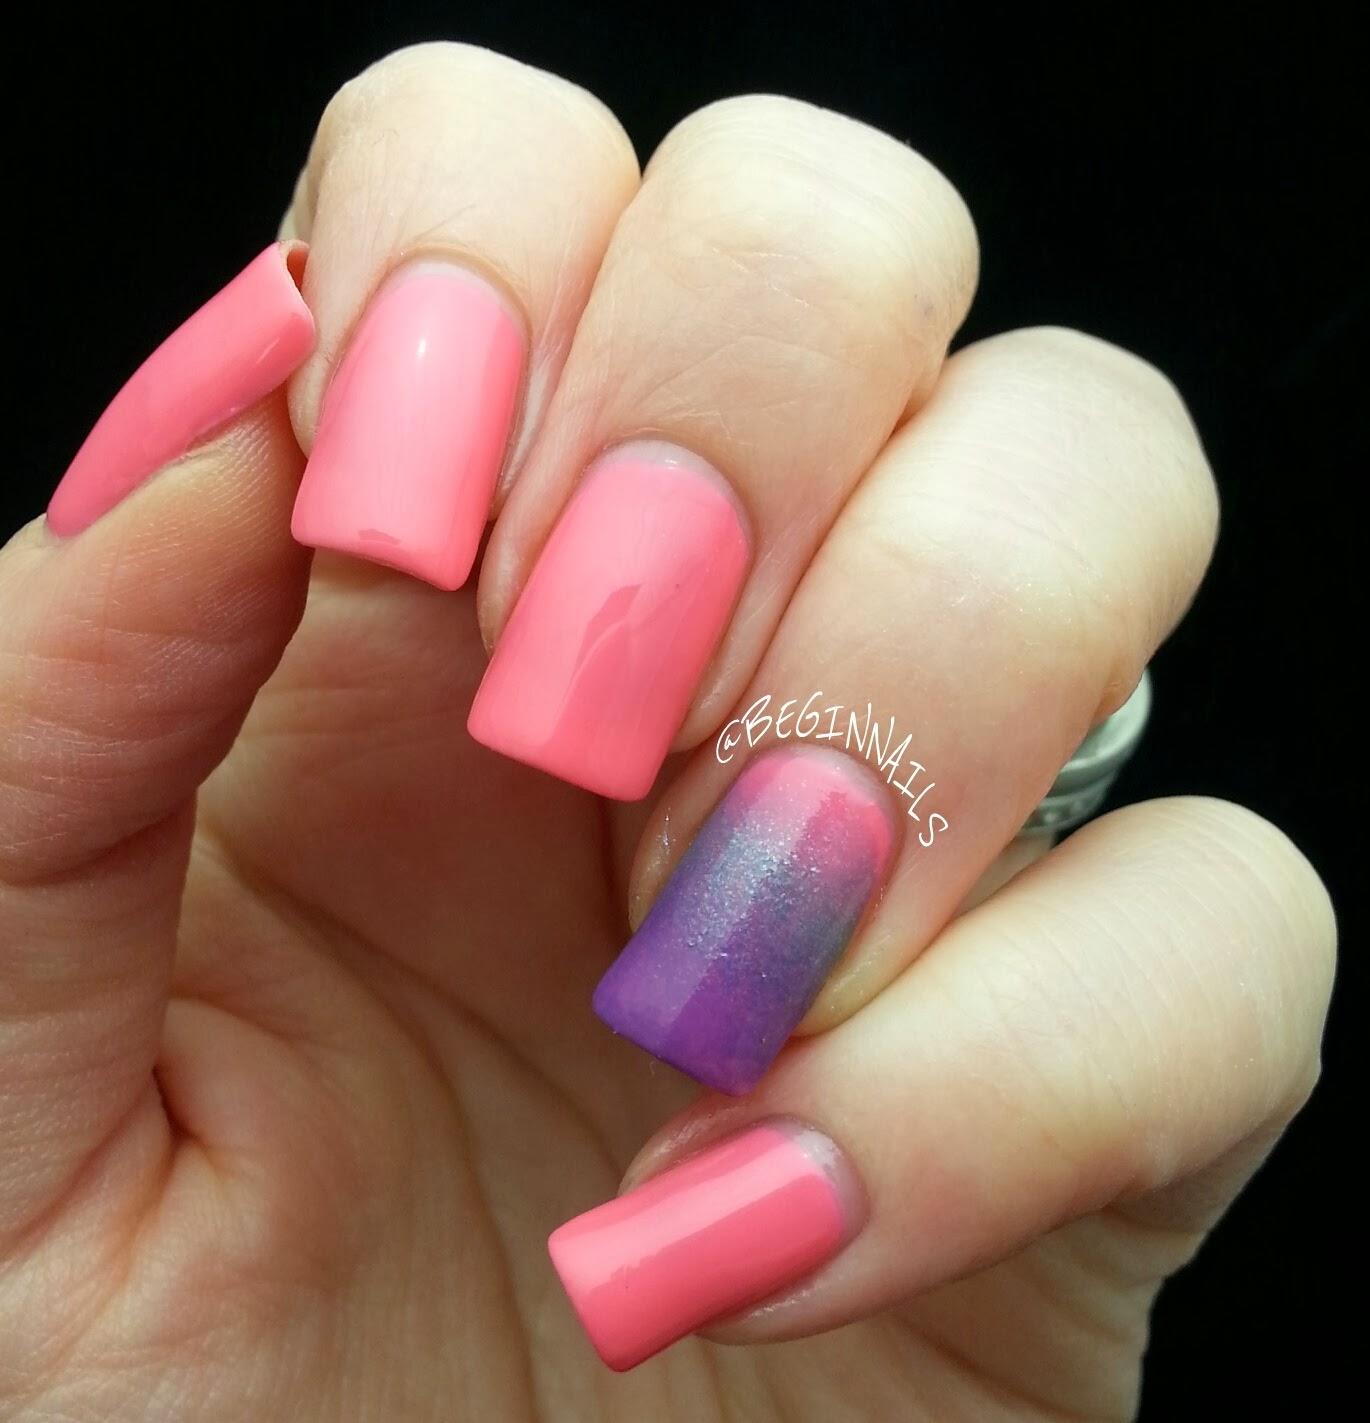 Finger Nail Paint: Let's Begin Nails: Drip Drop Nail Paint Swatches & Review